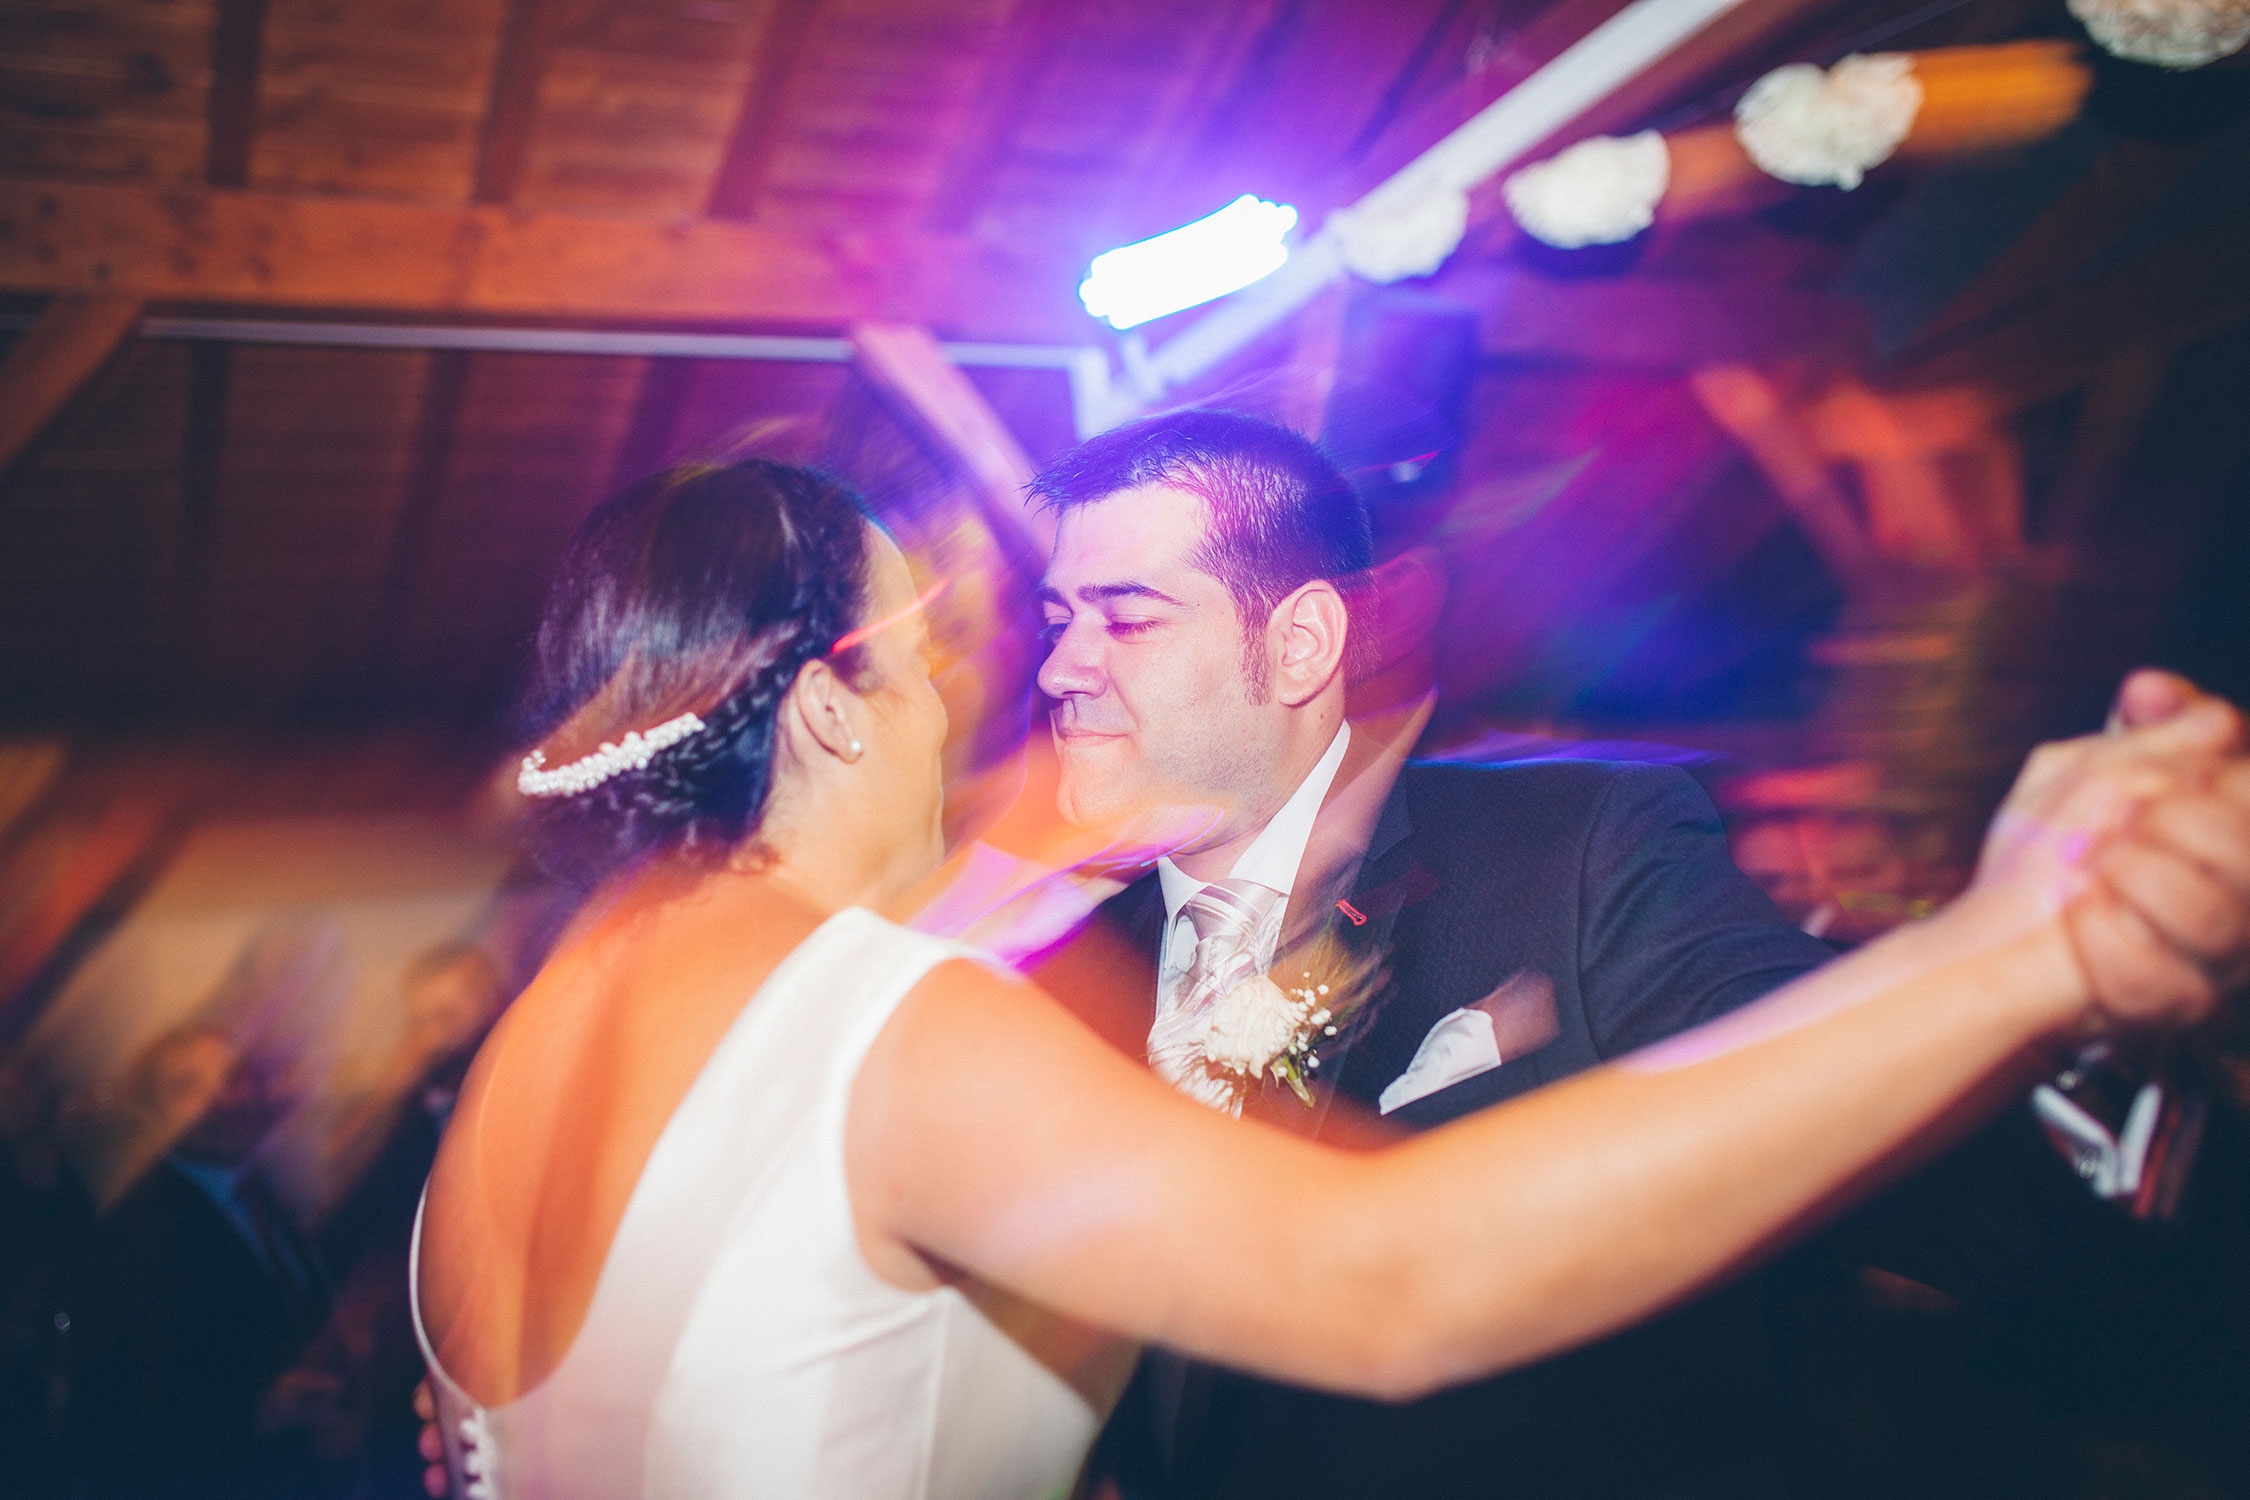 primer baile, boda en arcos de quejana organizada por Conmemora wedding planner